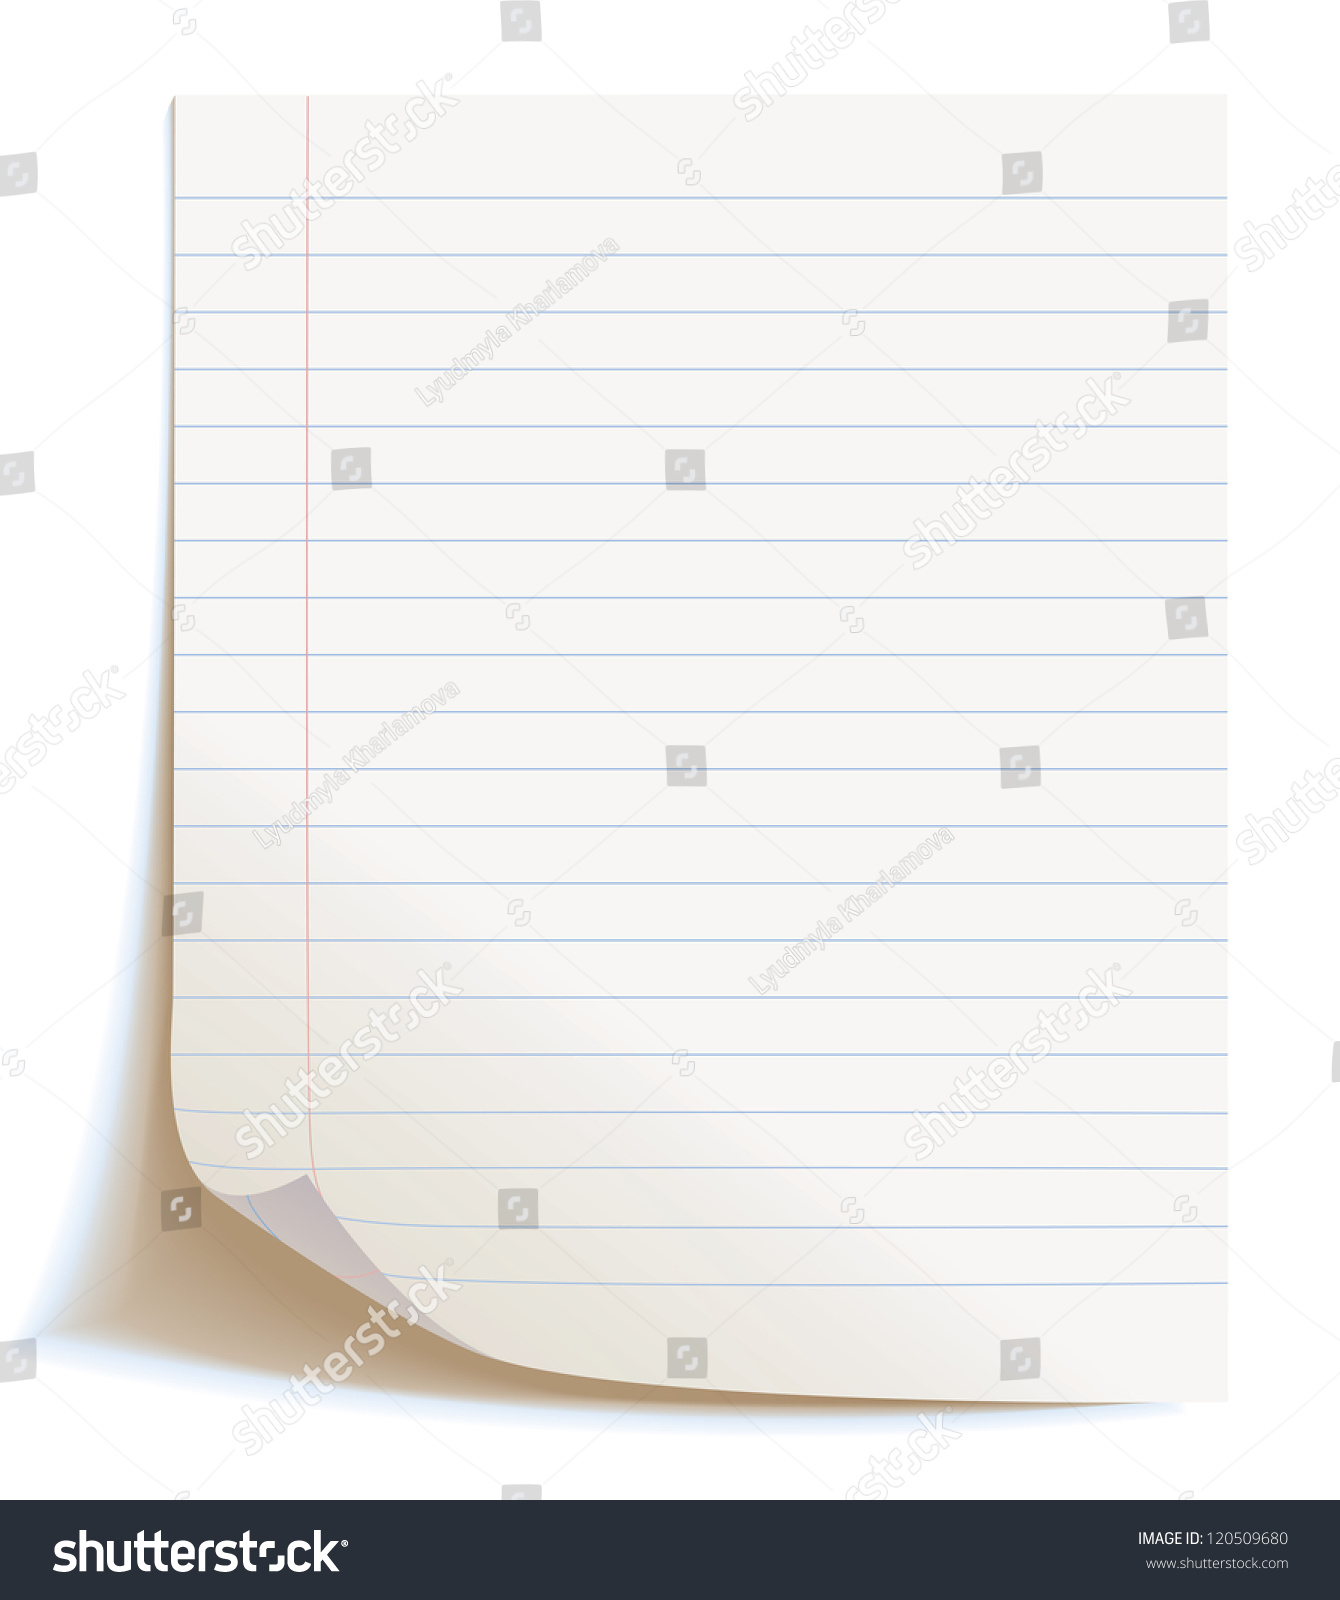 Blank Worksheet Exercise Book Isolated On White